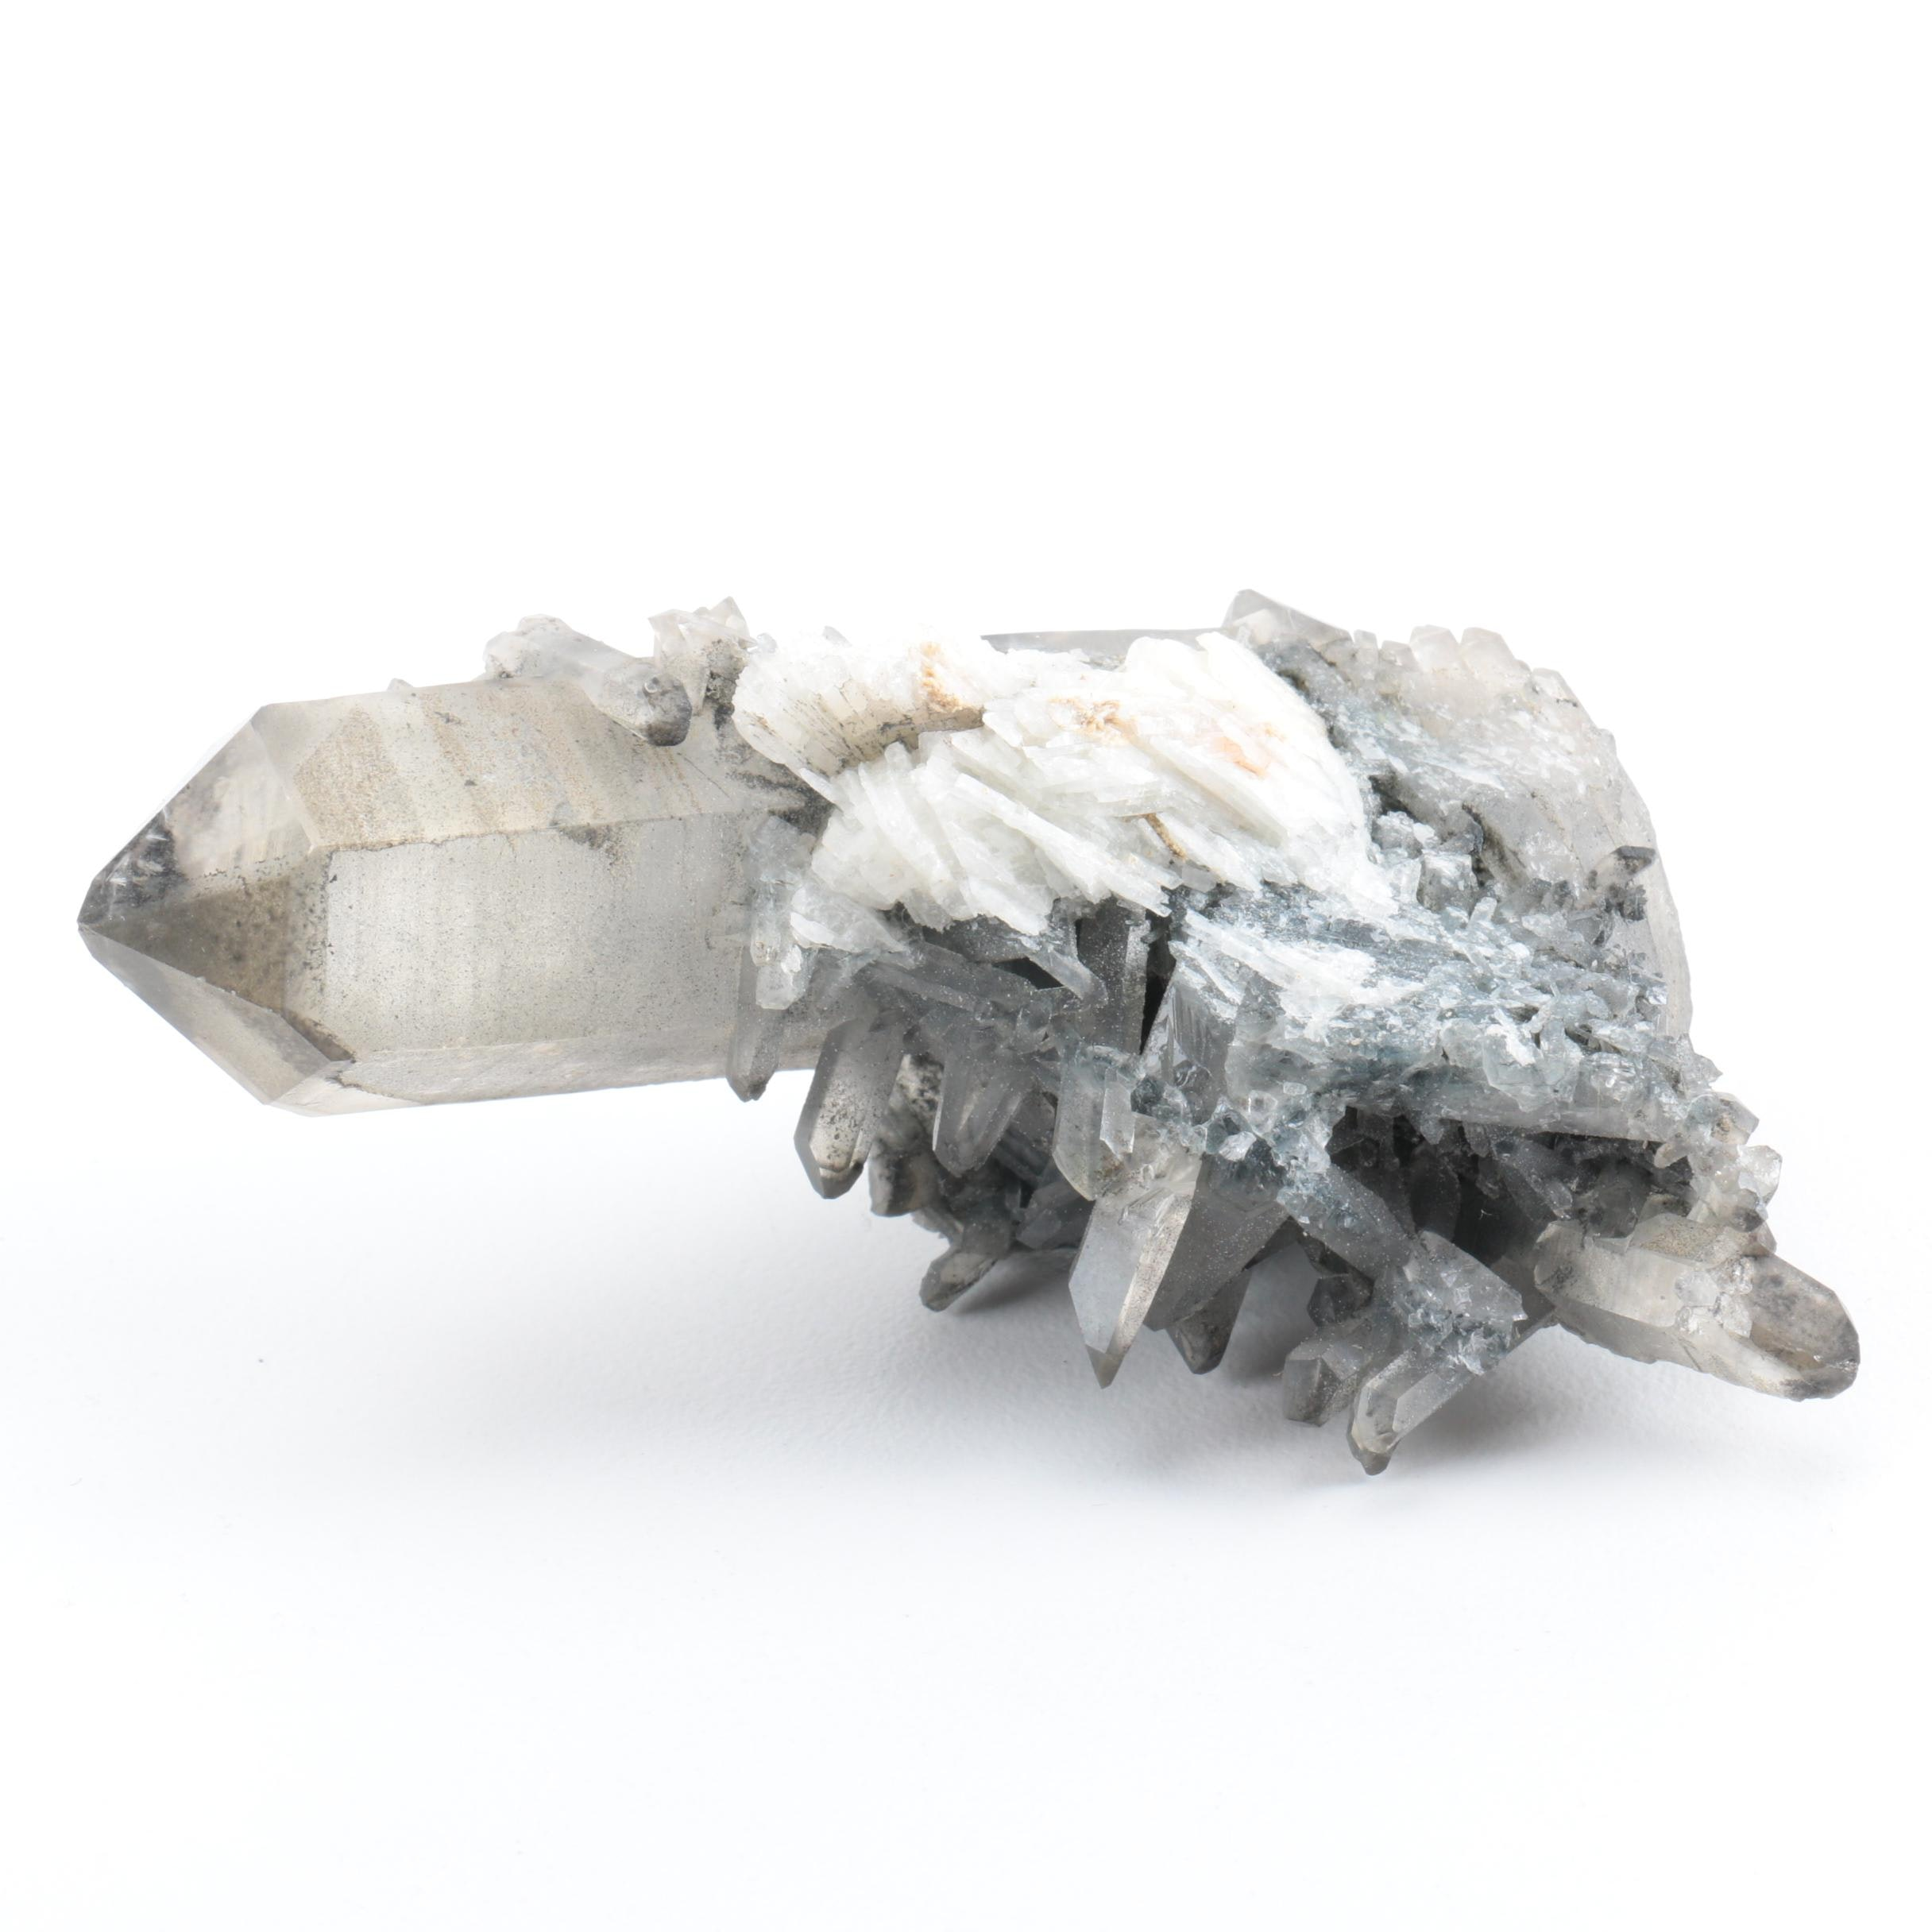 Tourmaline on Quartz Crystal Specimen